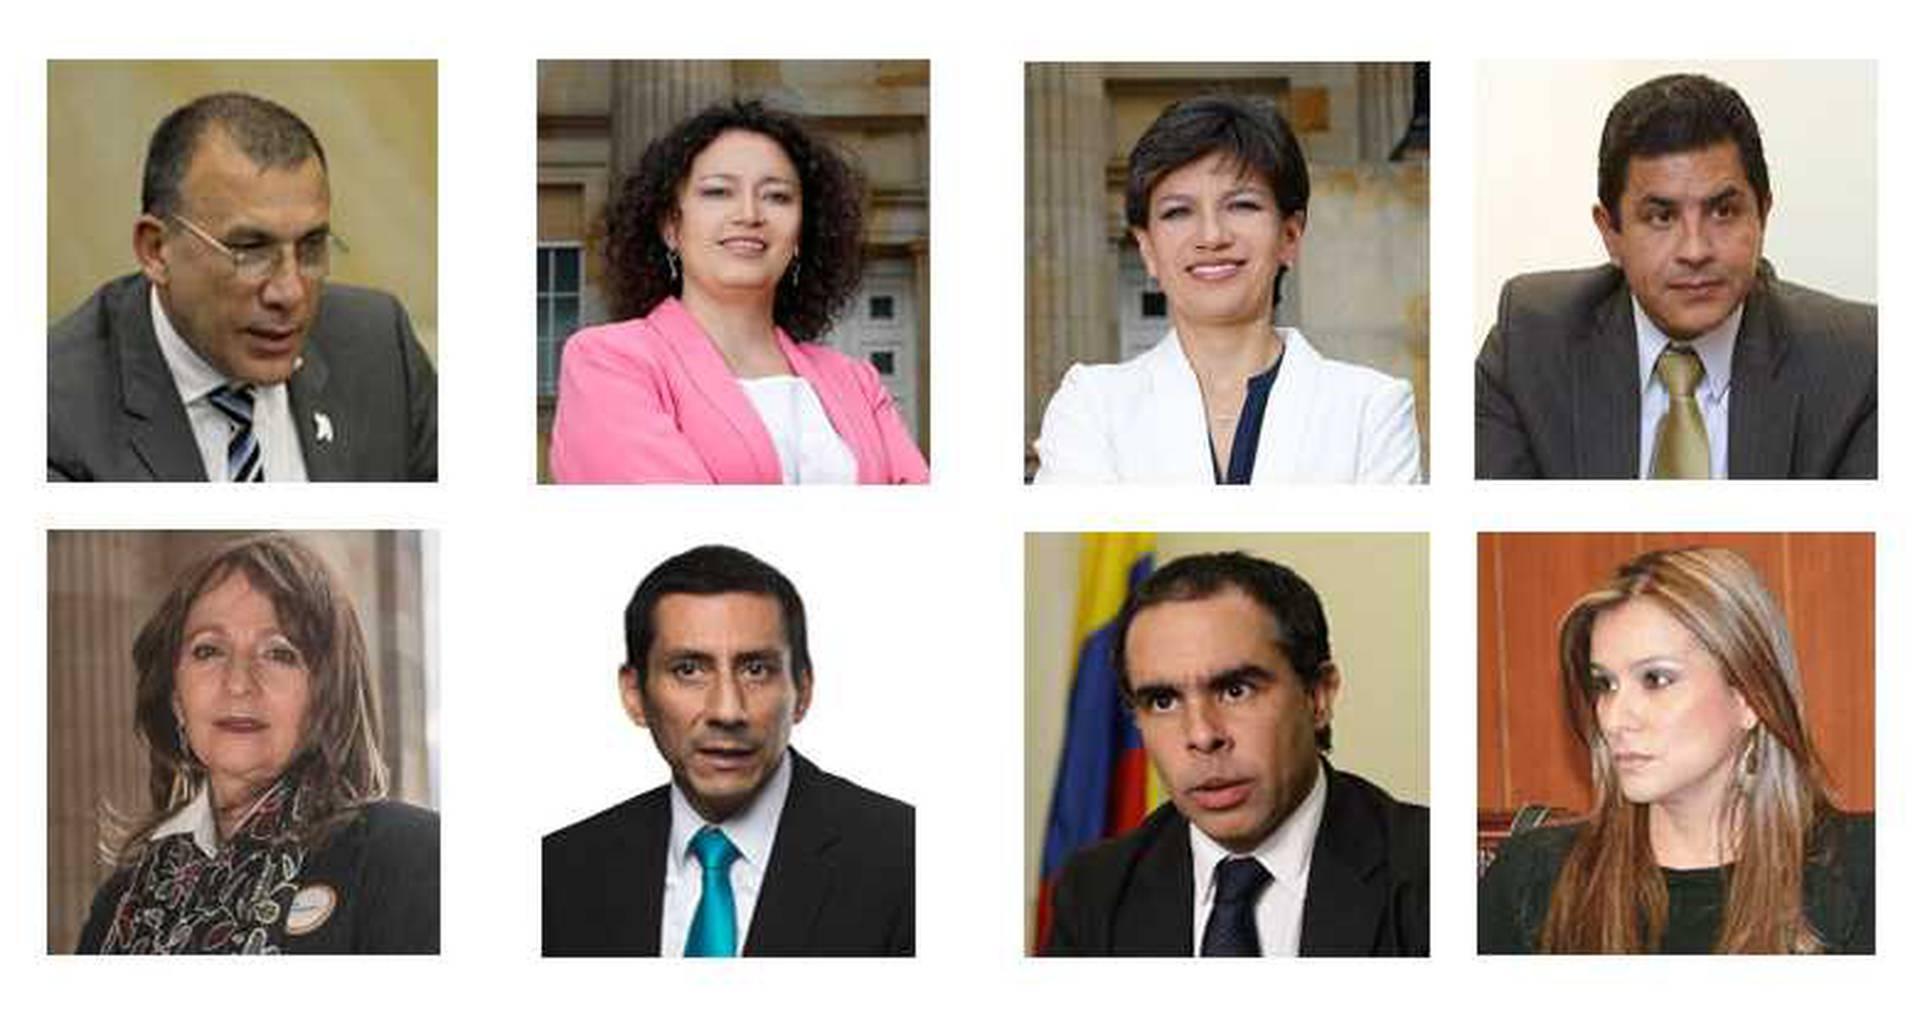 Roy Barreras, Angélica Lozano, Claudia López, Jorge Iván Ospina, Angela María Robledo, Jimmy Chamorro, Armando Benedetti, Maritza Martínez.